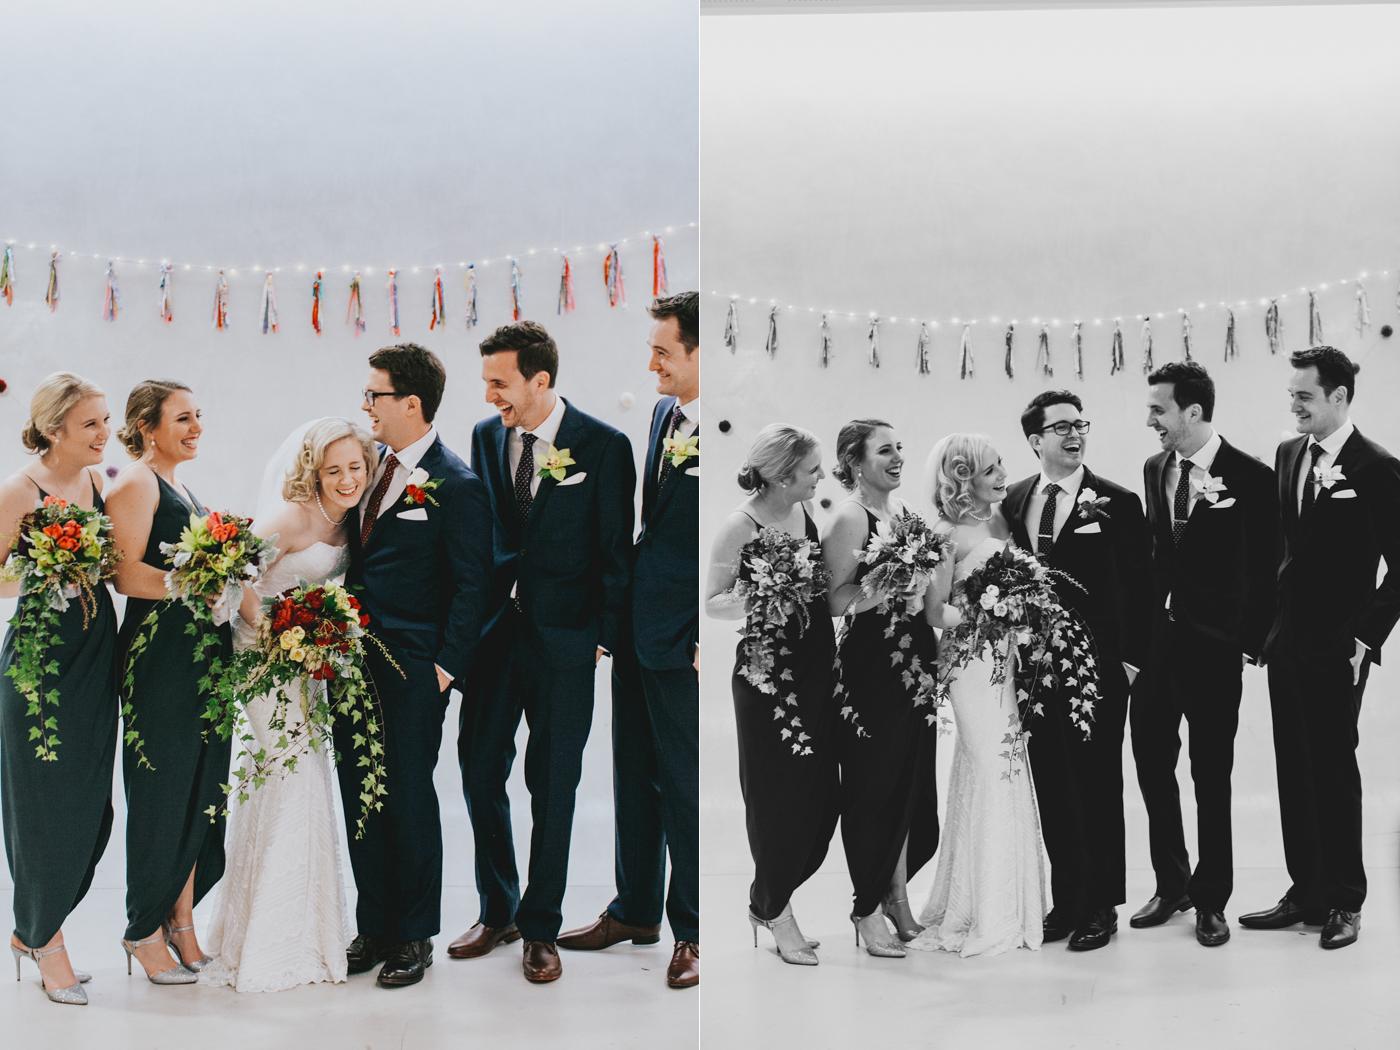 Jo & Tom Wedding - The Grounds of Alexandria - Samantha Heather Photography-170.jpg